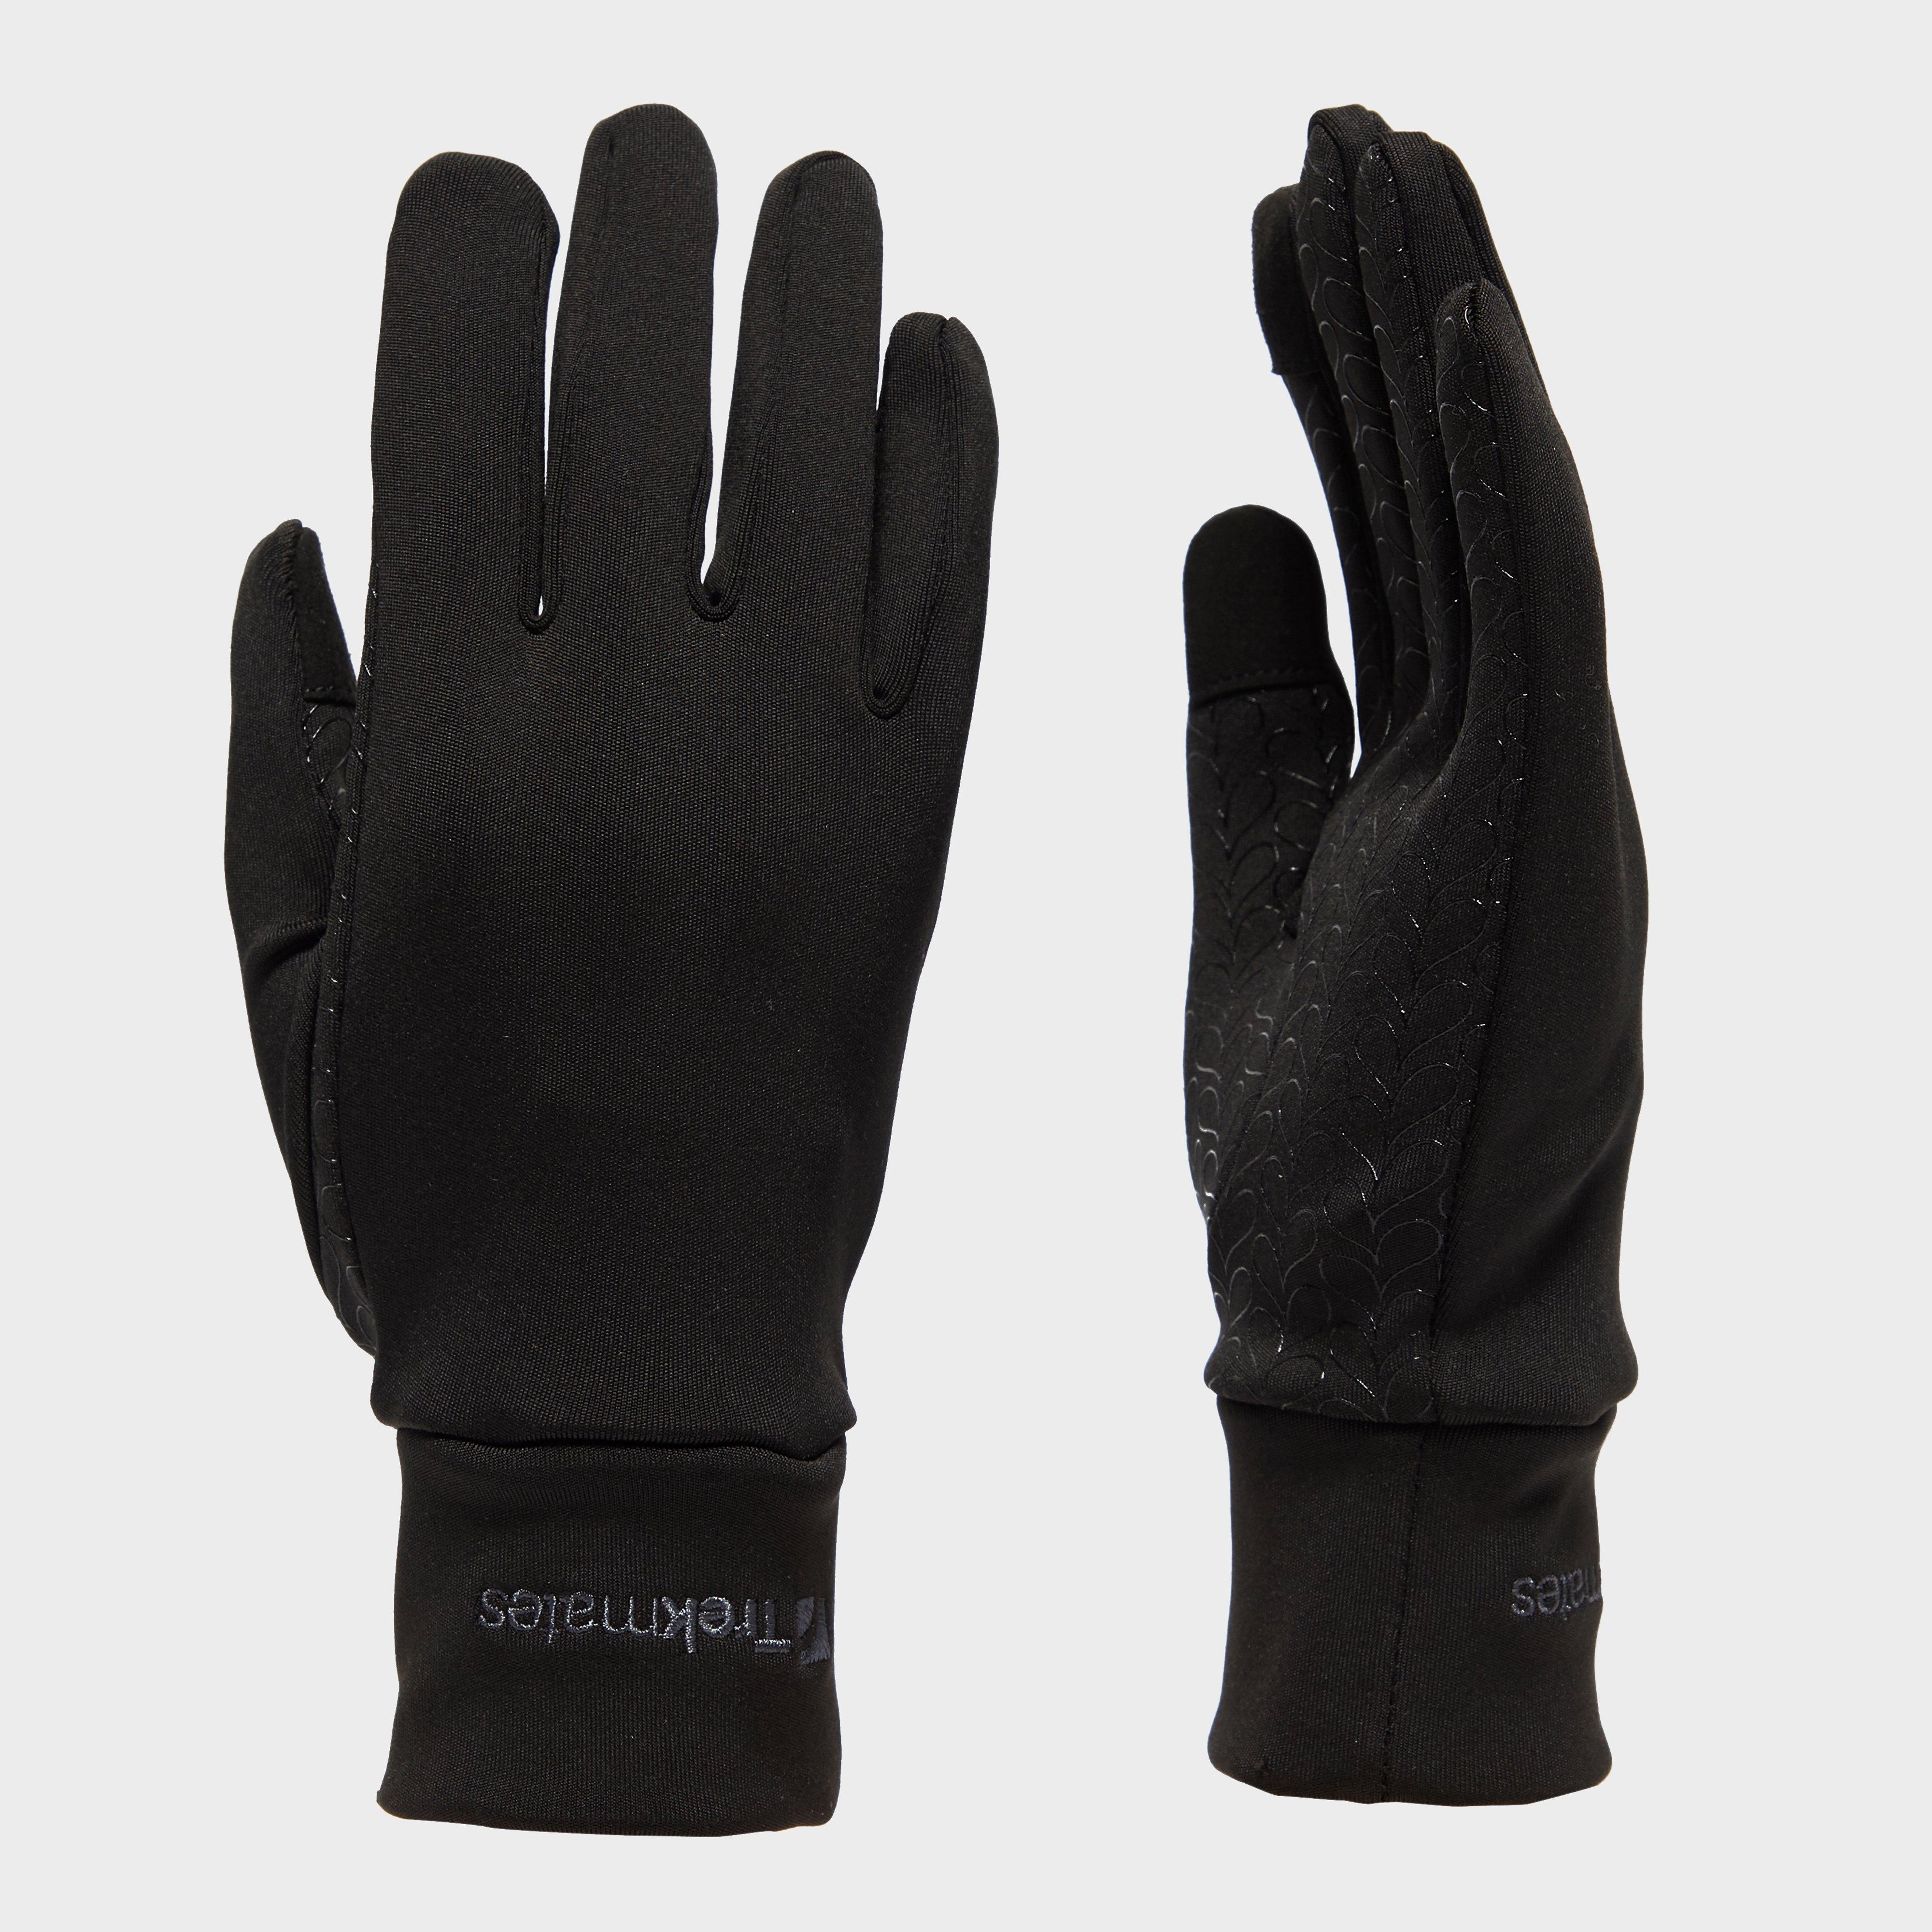 Trekmates Women's Touchscreen Grip Gloves, Black